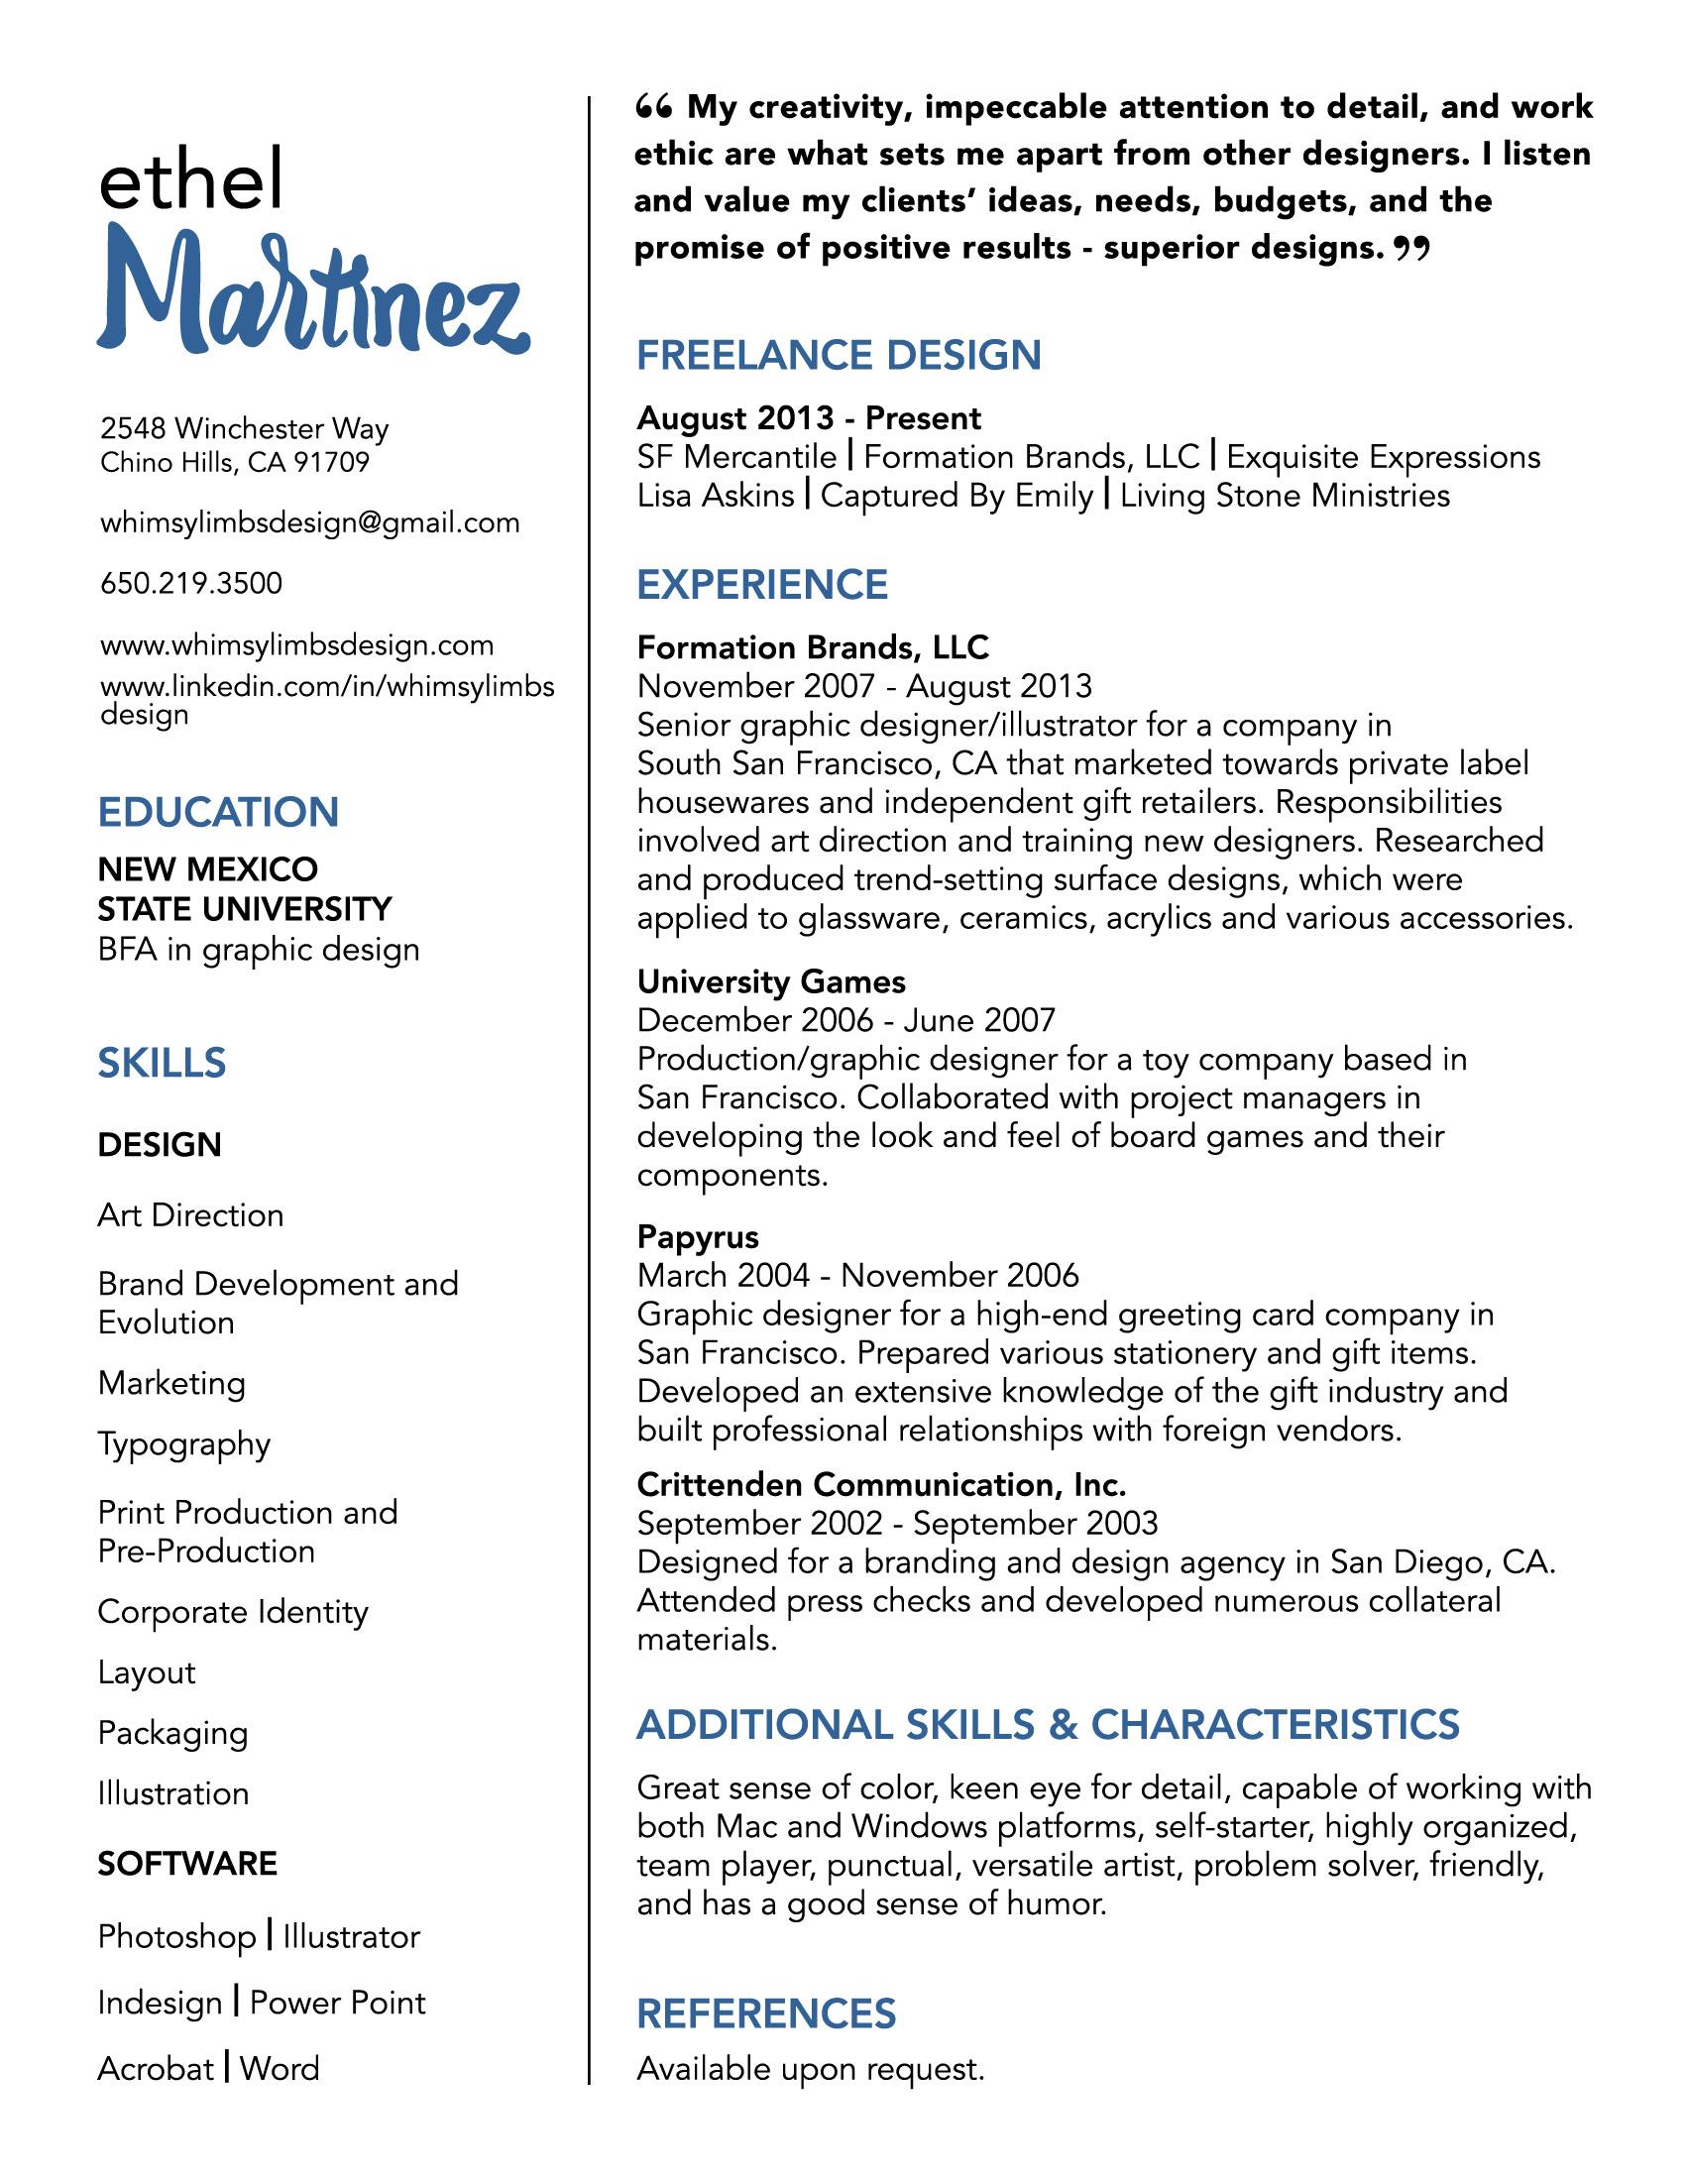 EthelMartinez-Resume2016.jpg